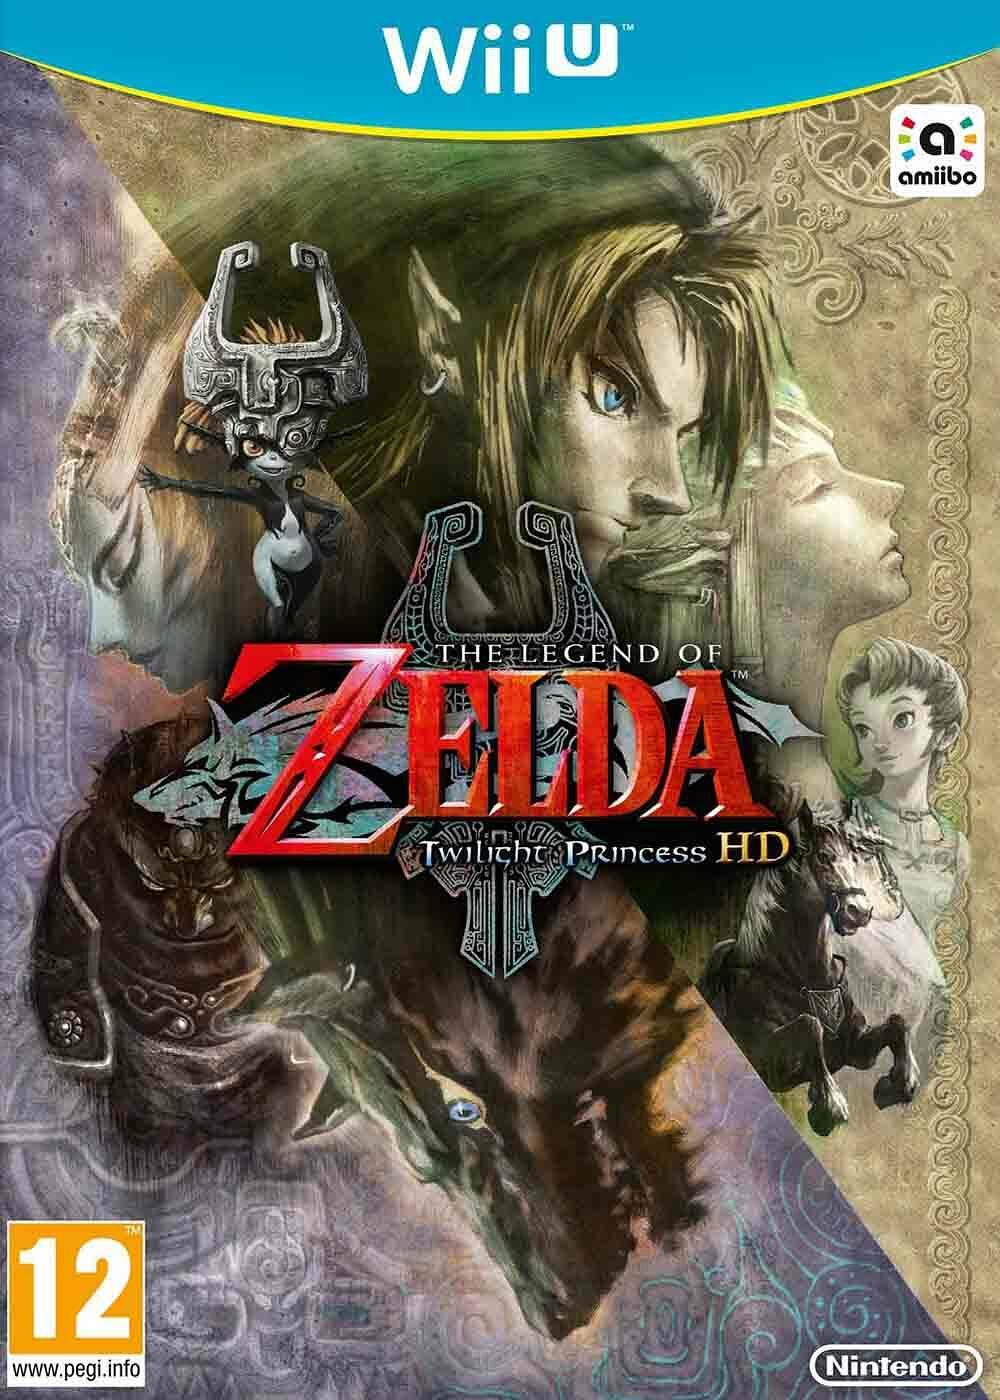 The Legend Of Zelda : Twilight Princess HD |